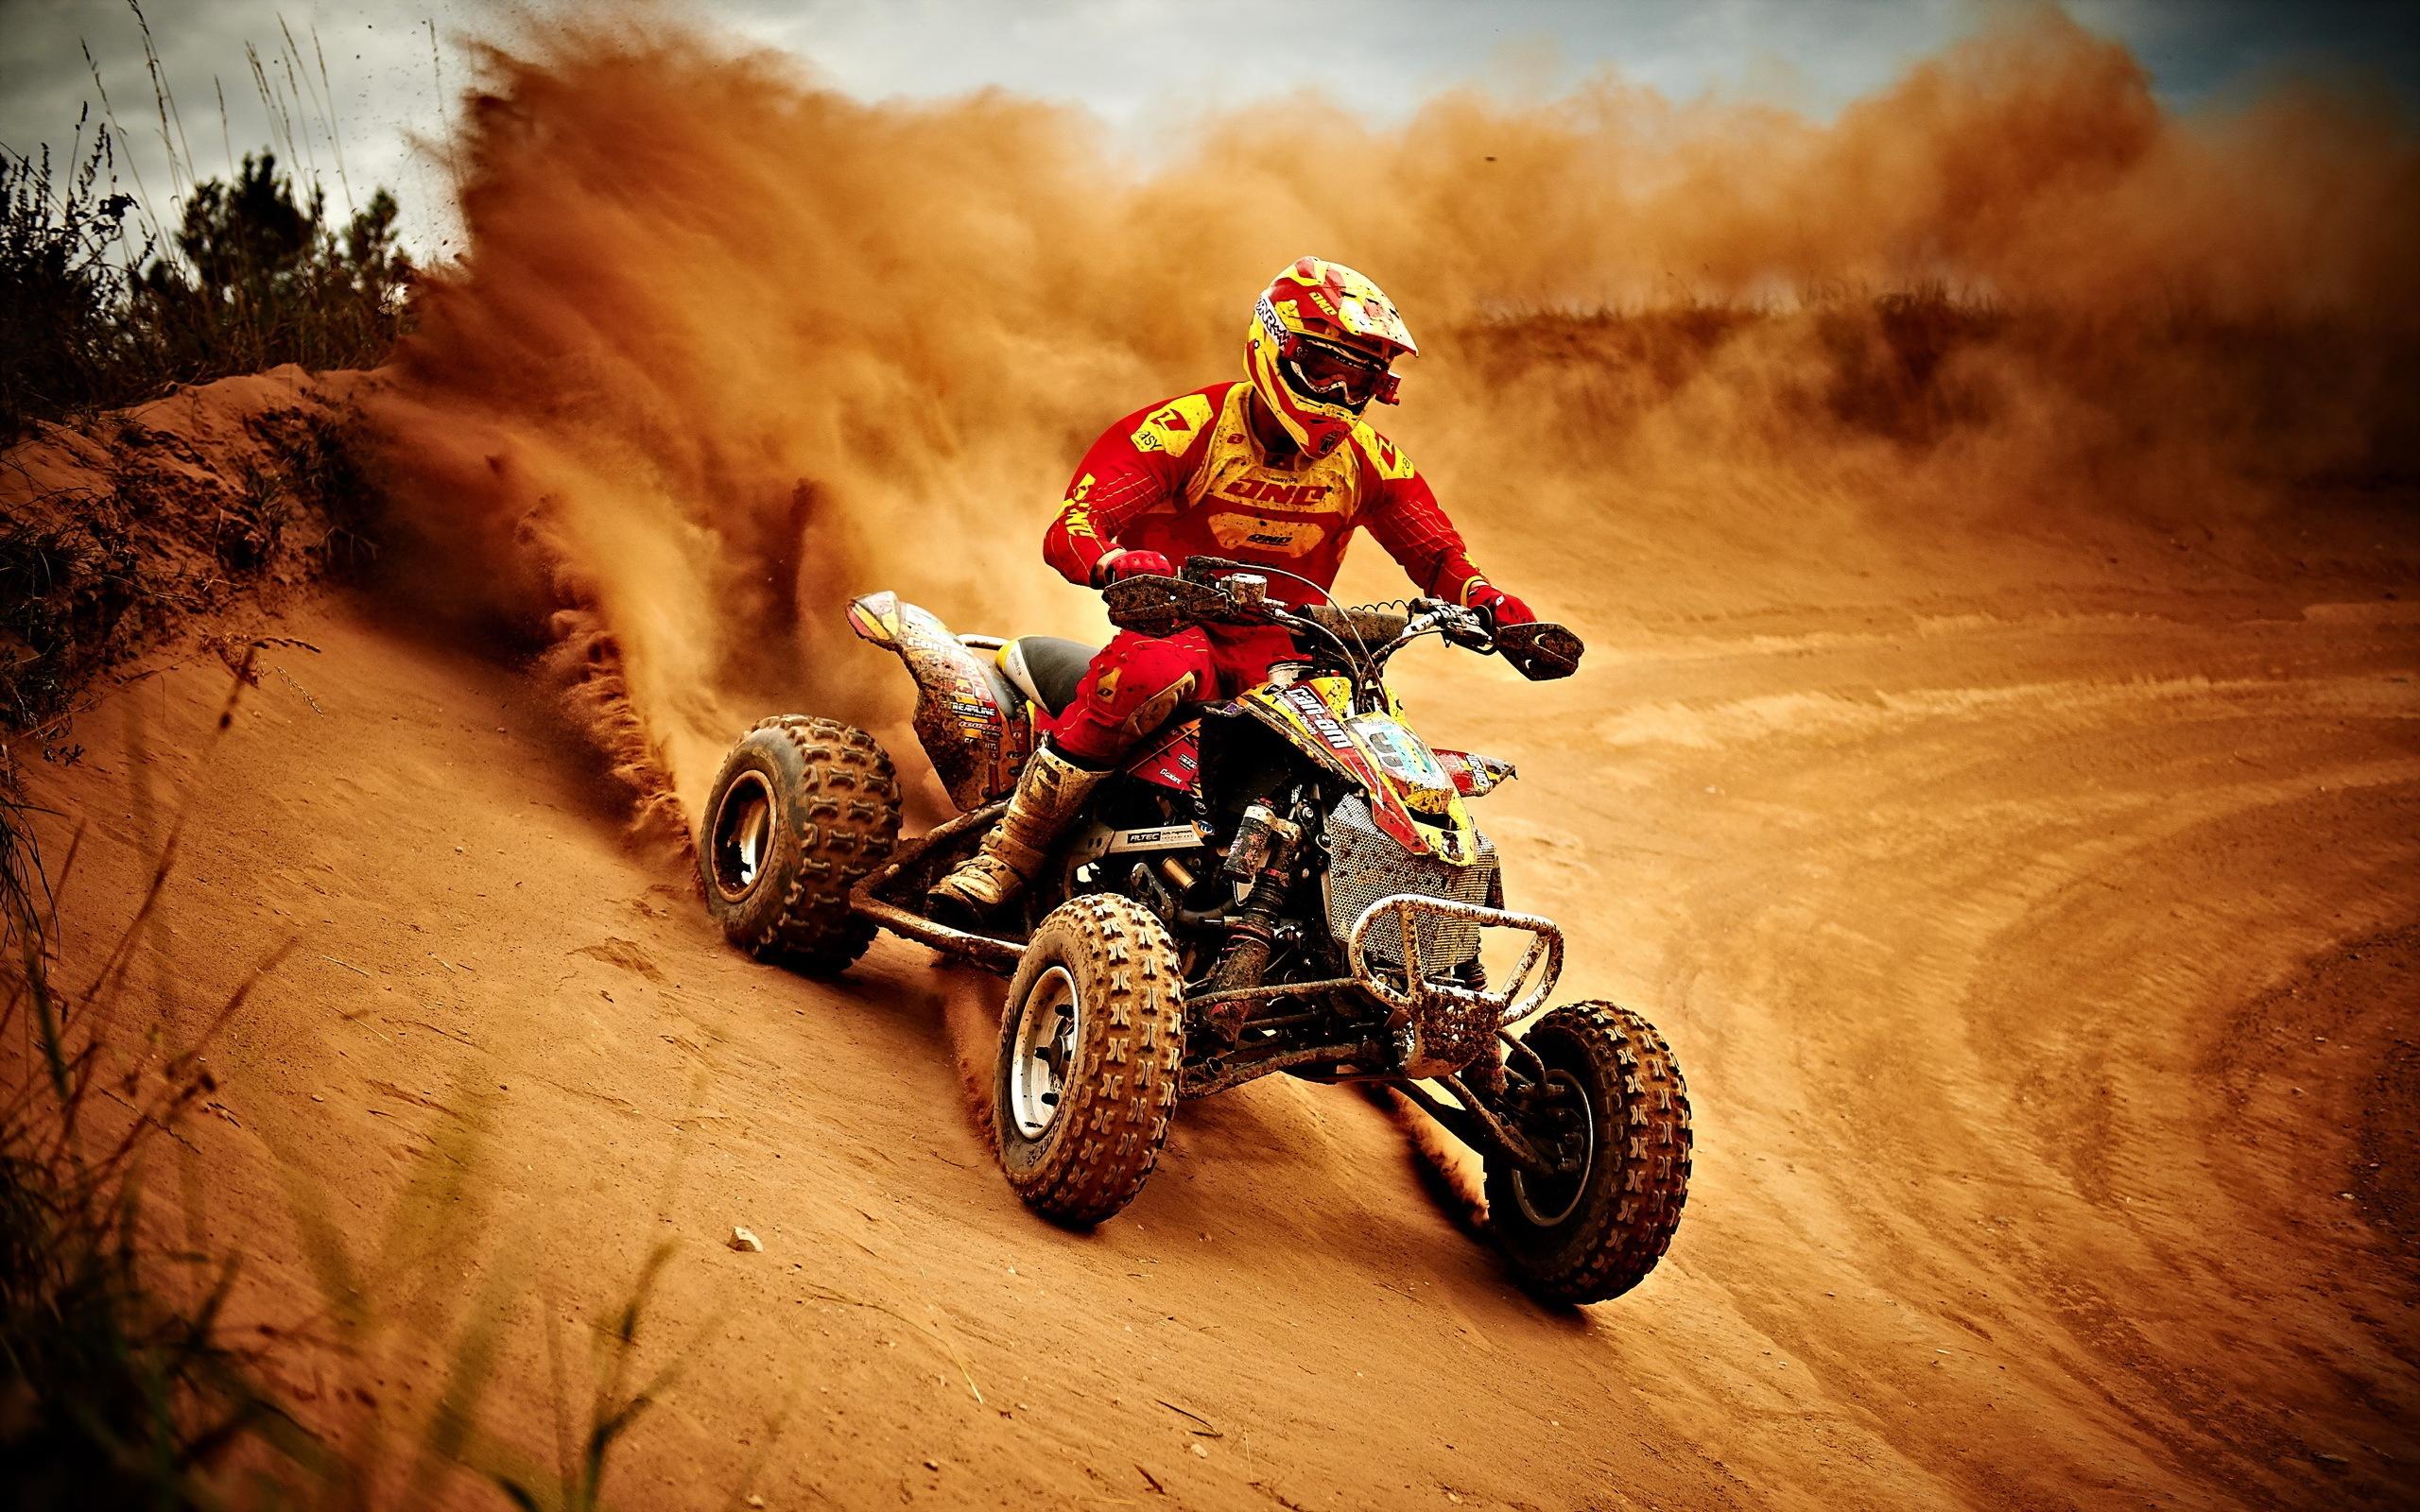 спорт квадрацикл sports the ATV загрузить